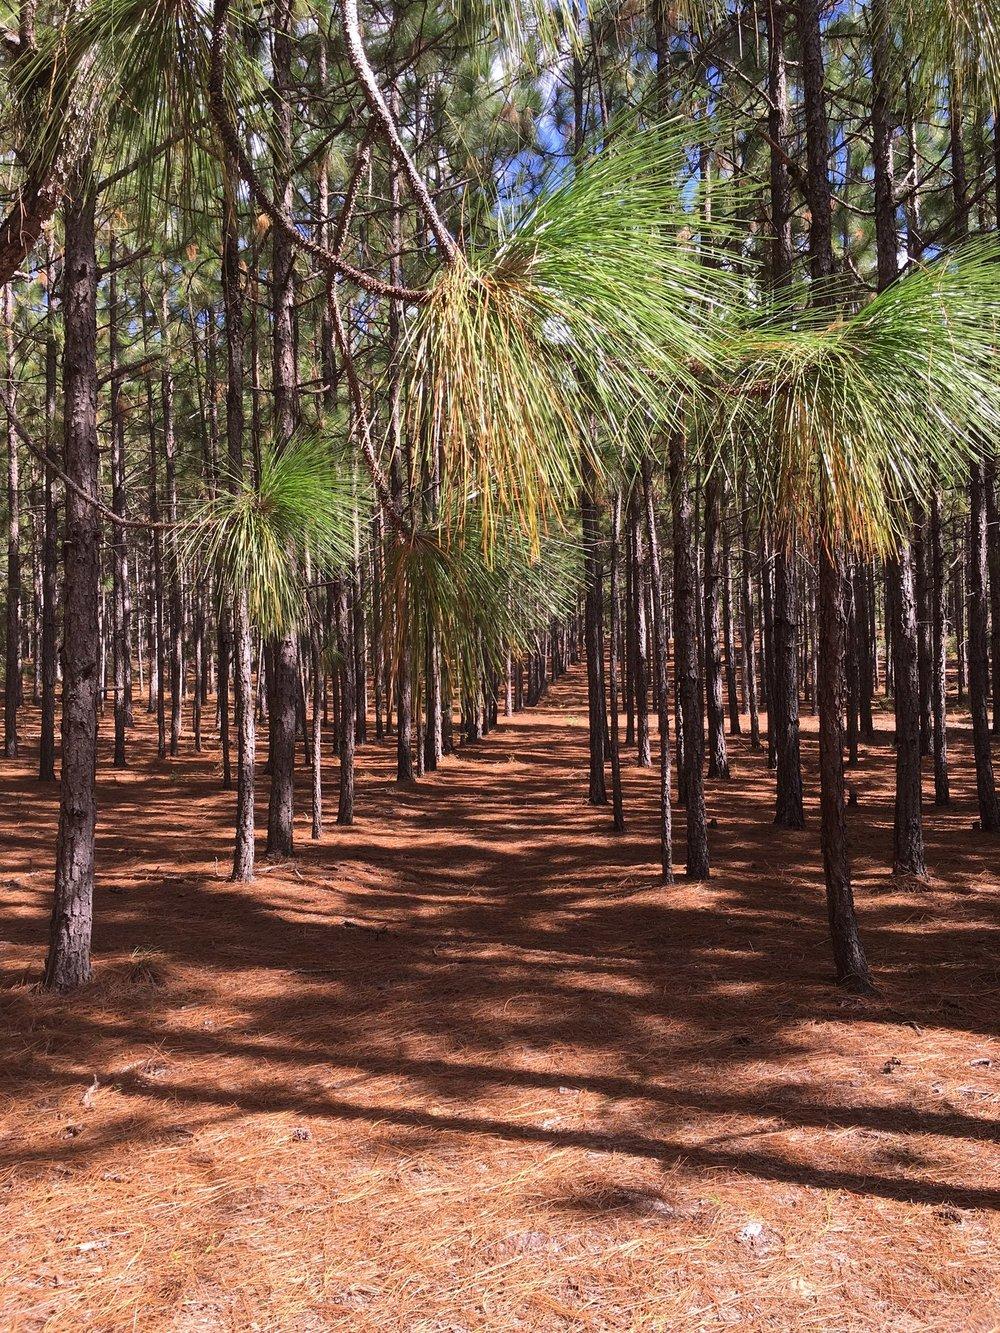 Longleaf pine tree shedding their pine needles.